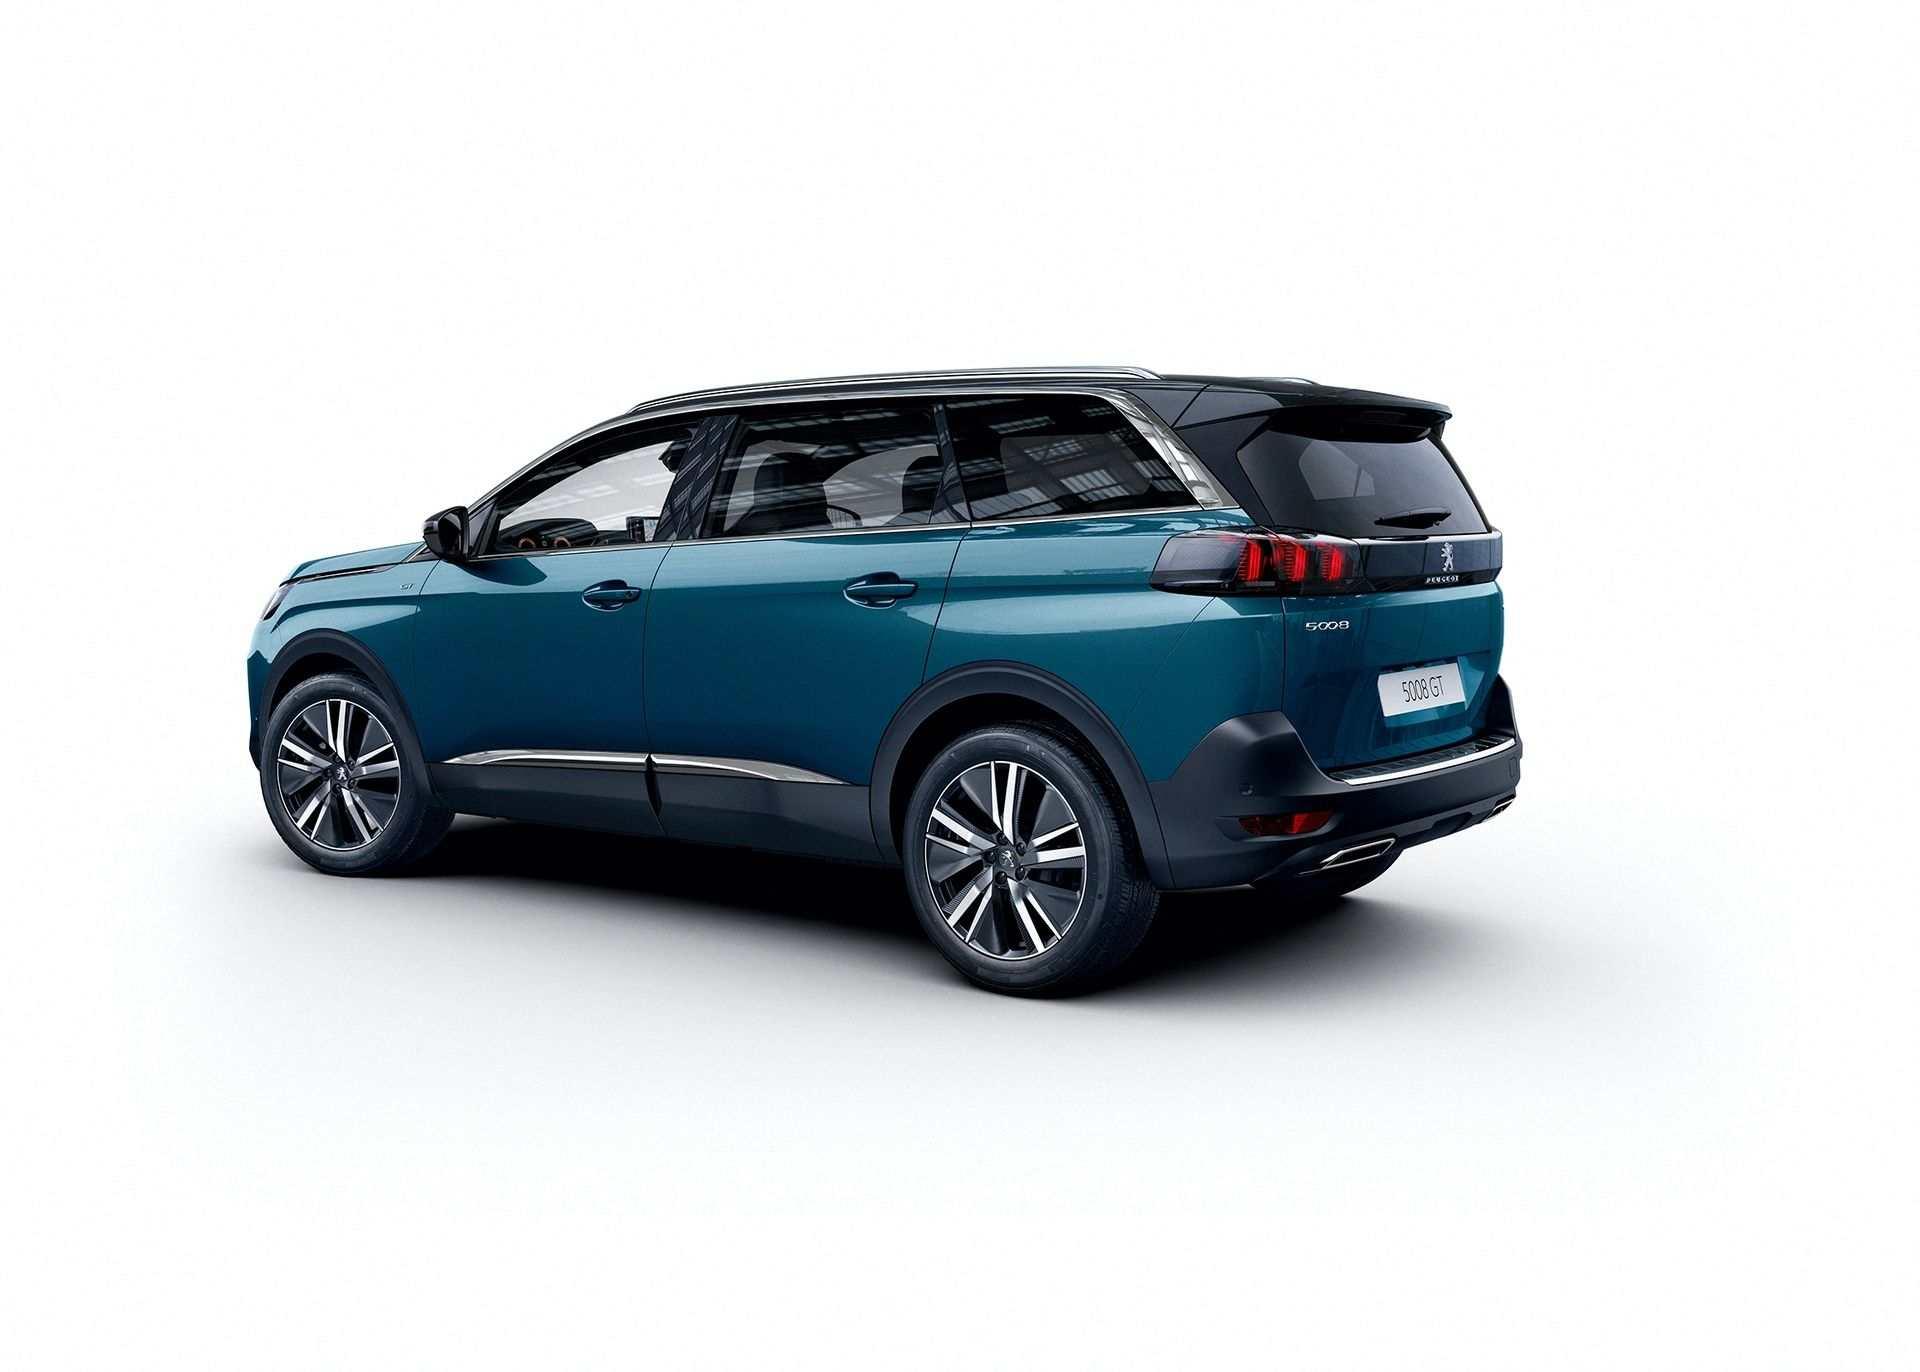 Peugeot_5008_facelift_0006